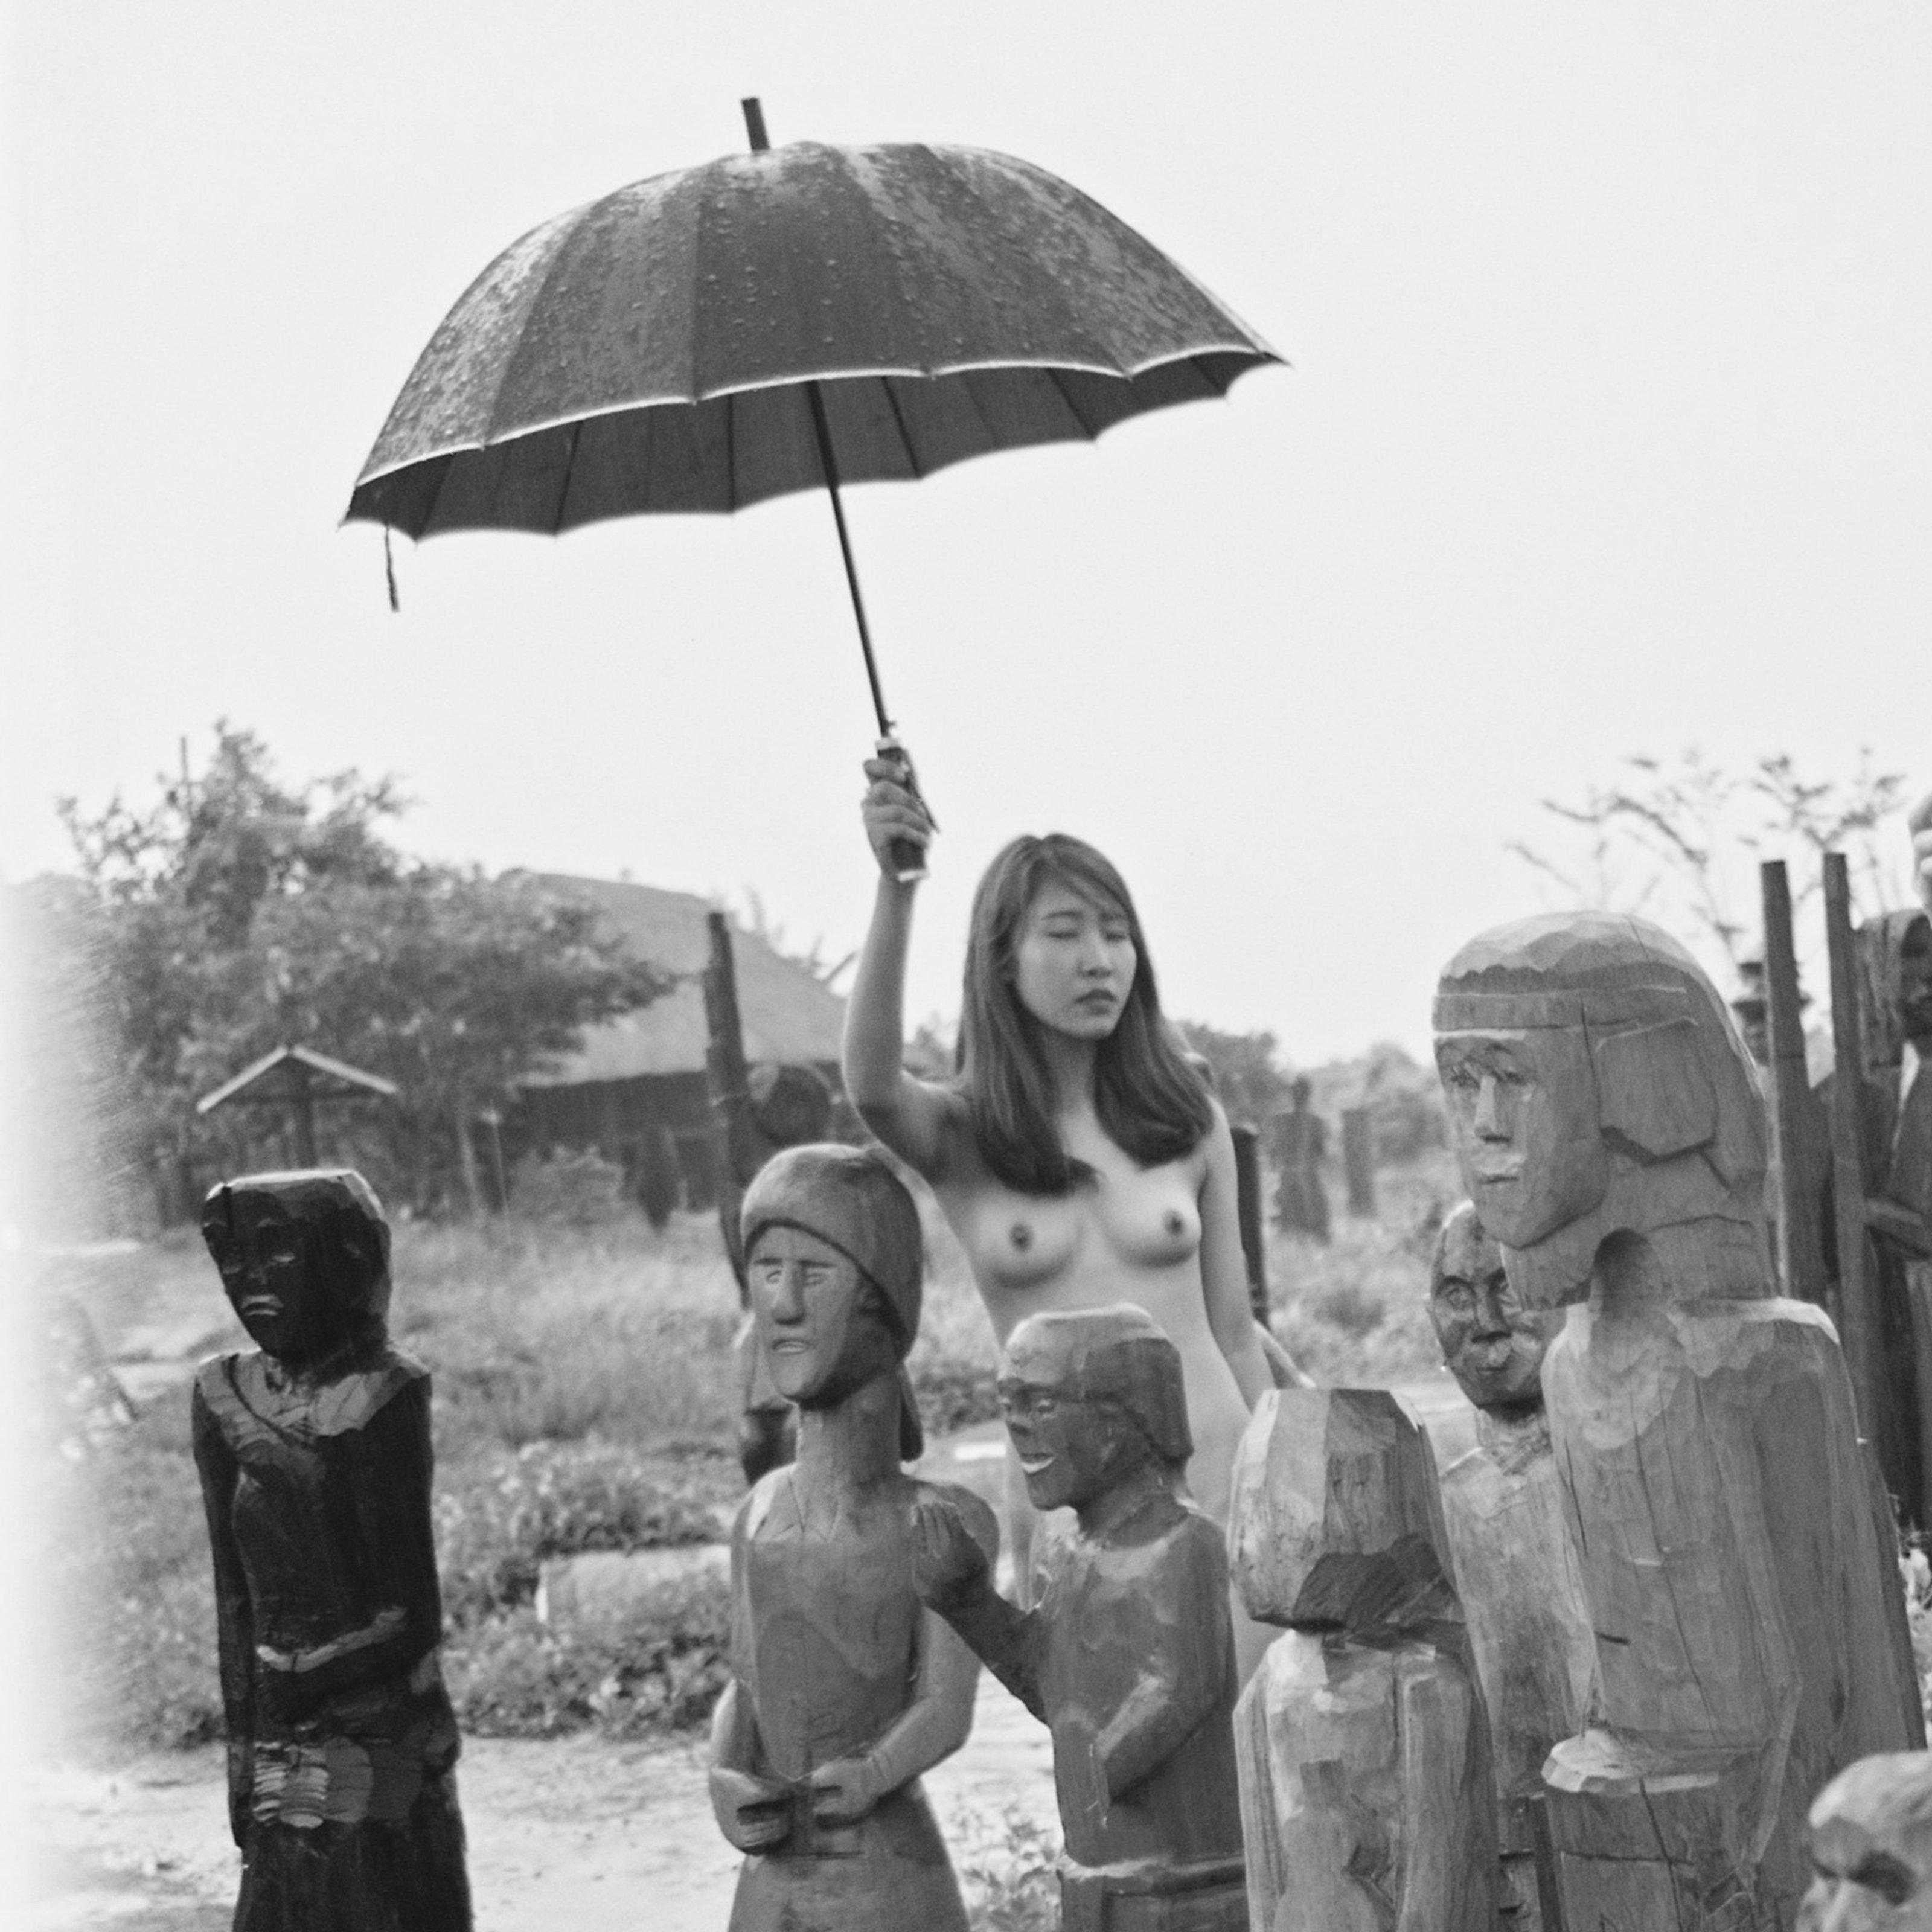 120 film, 6x6, Black and white, Hanoi, Negative, Nude, Vietnam, Woman, Nonh Dan